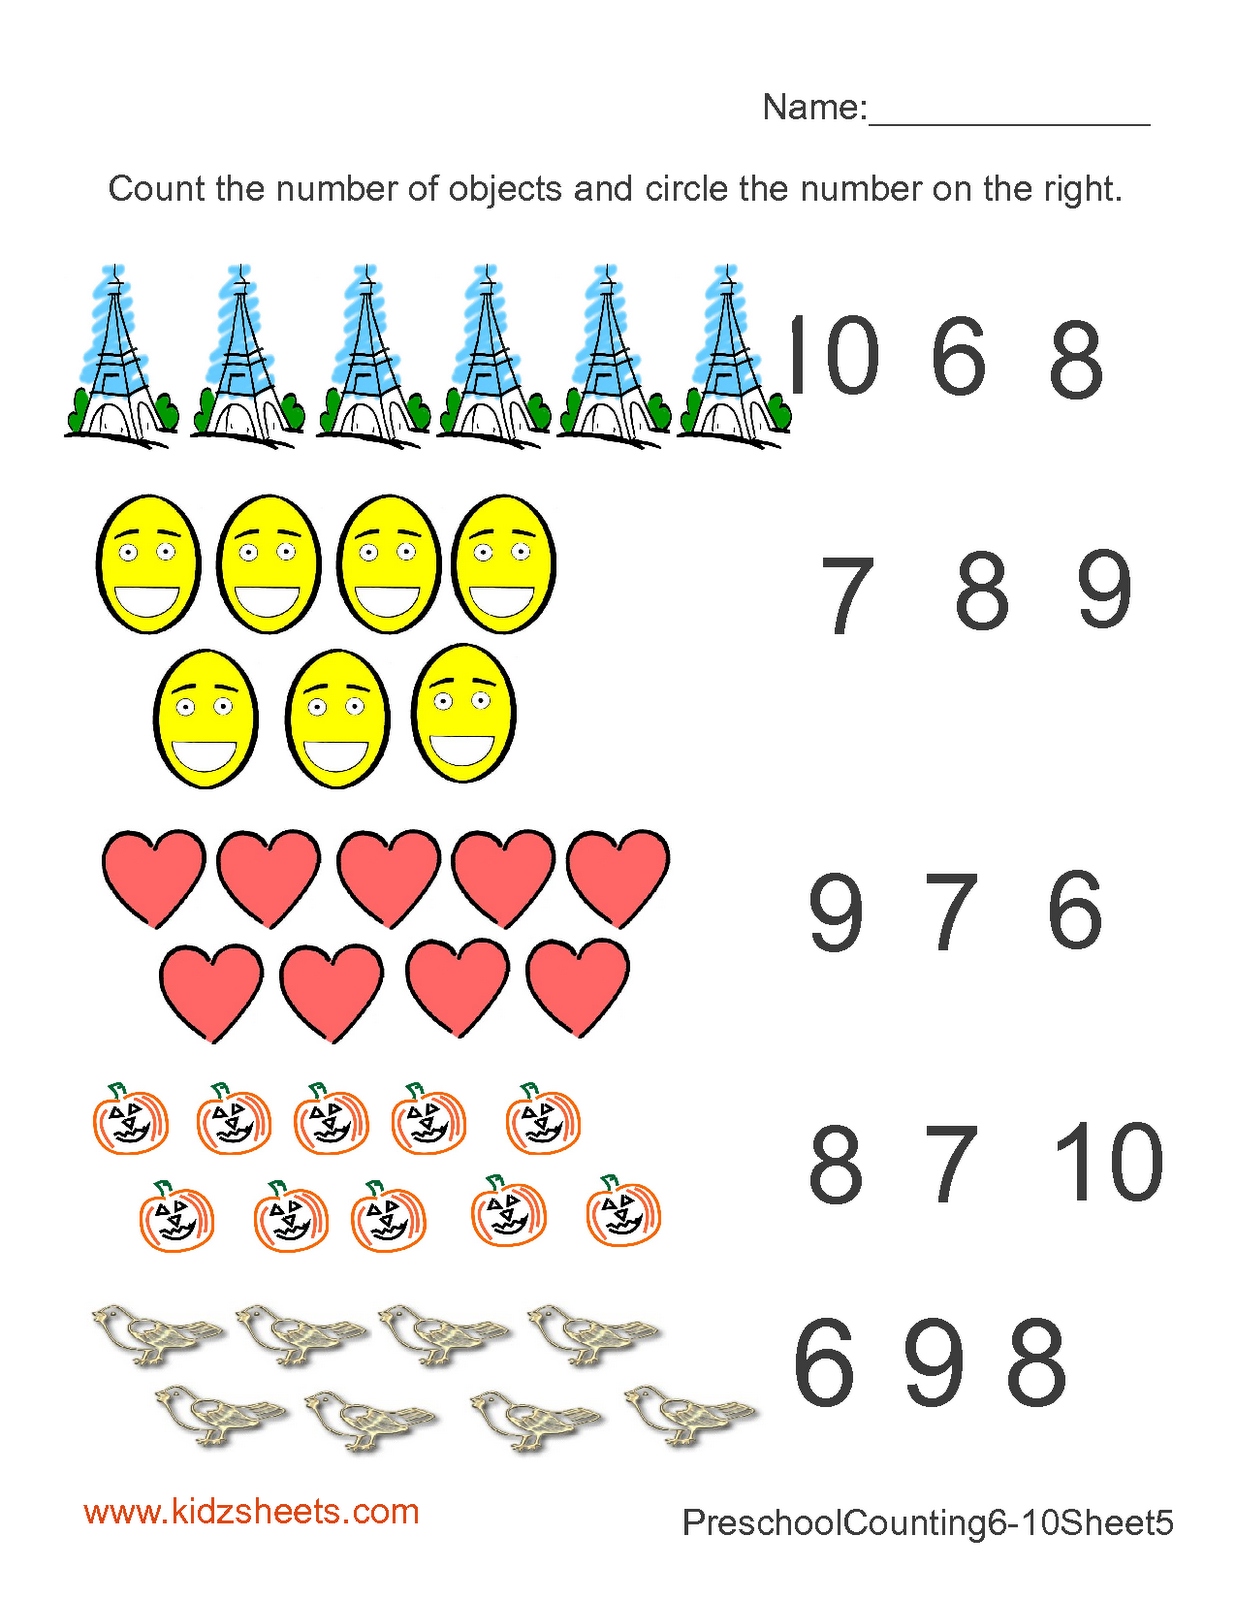 Worksheets Number Counting Worksheets counting preschool worksheets joomlti numbers burnout automotive